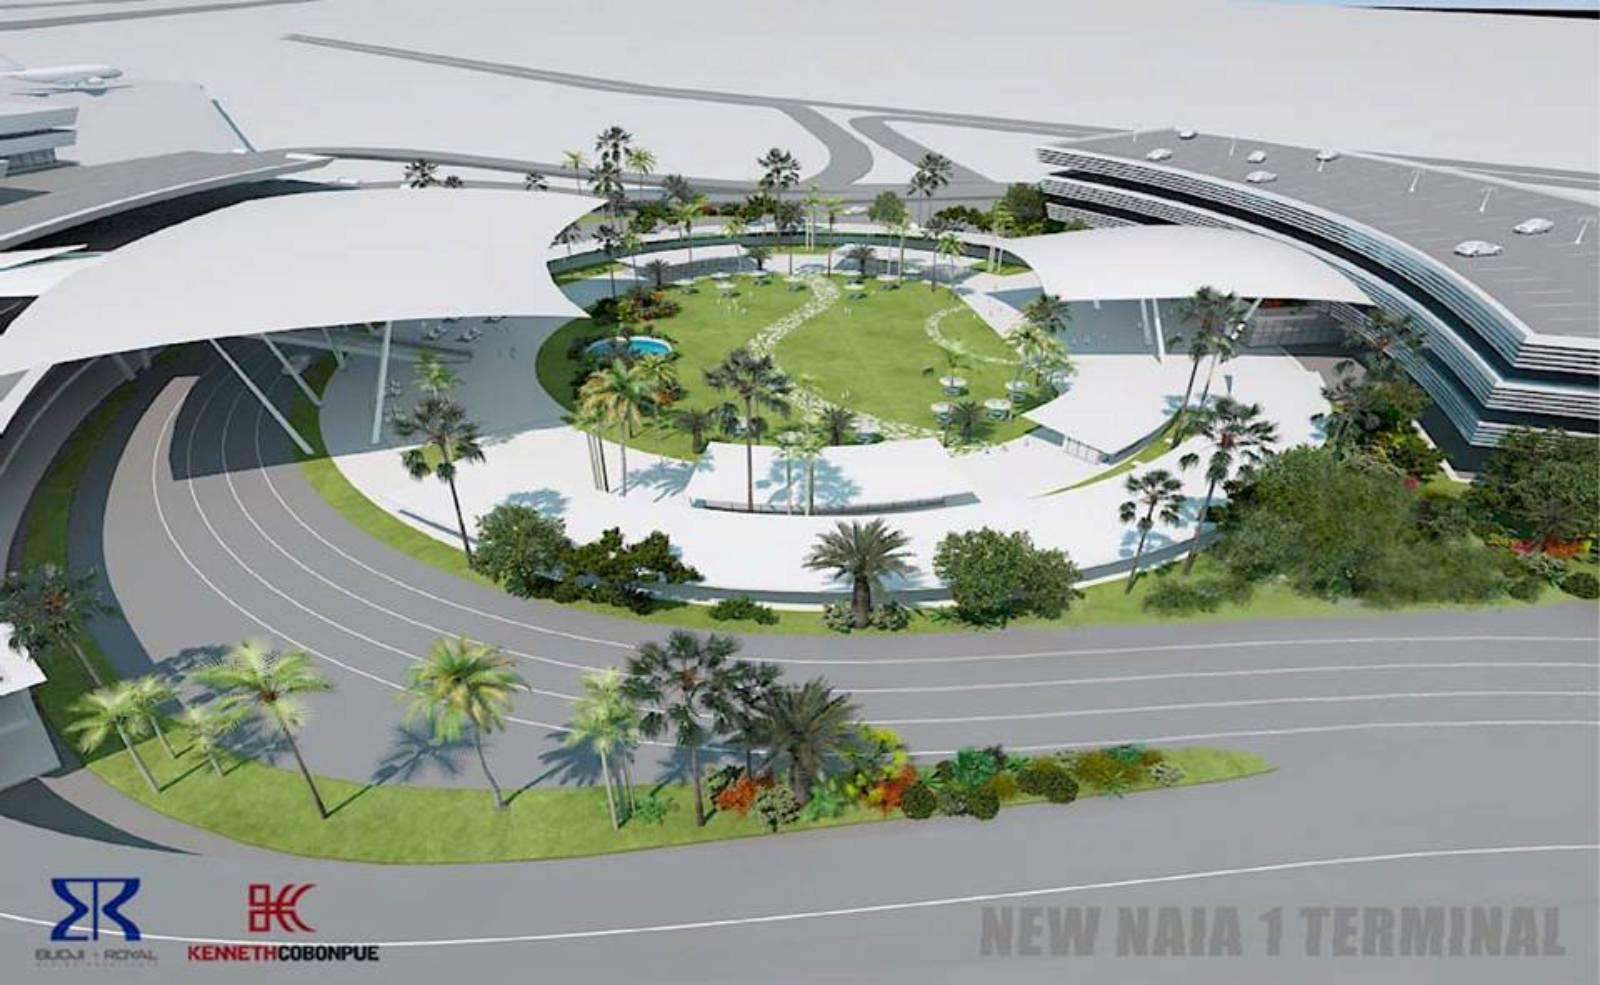 Naia Terminal 1 Rehabilitation A As Architecture